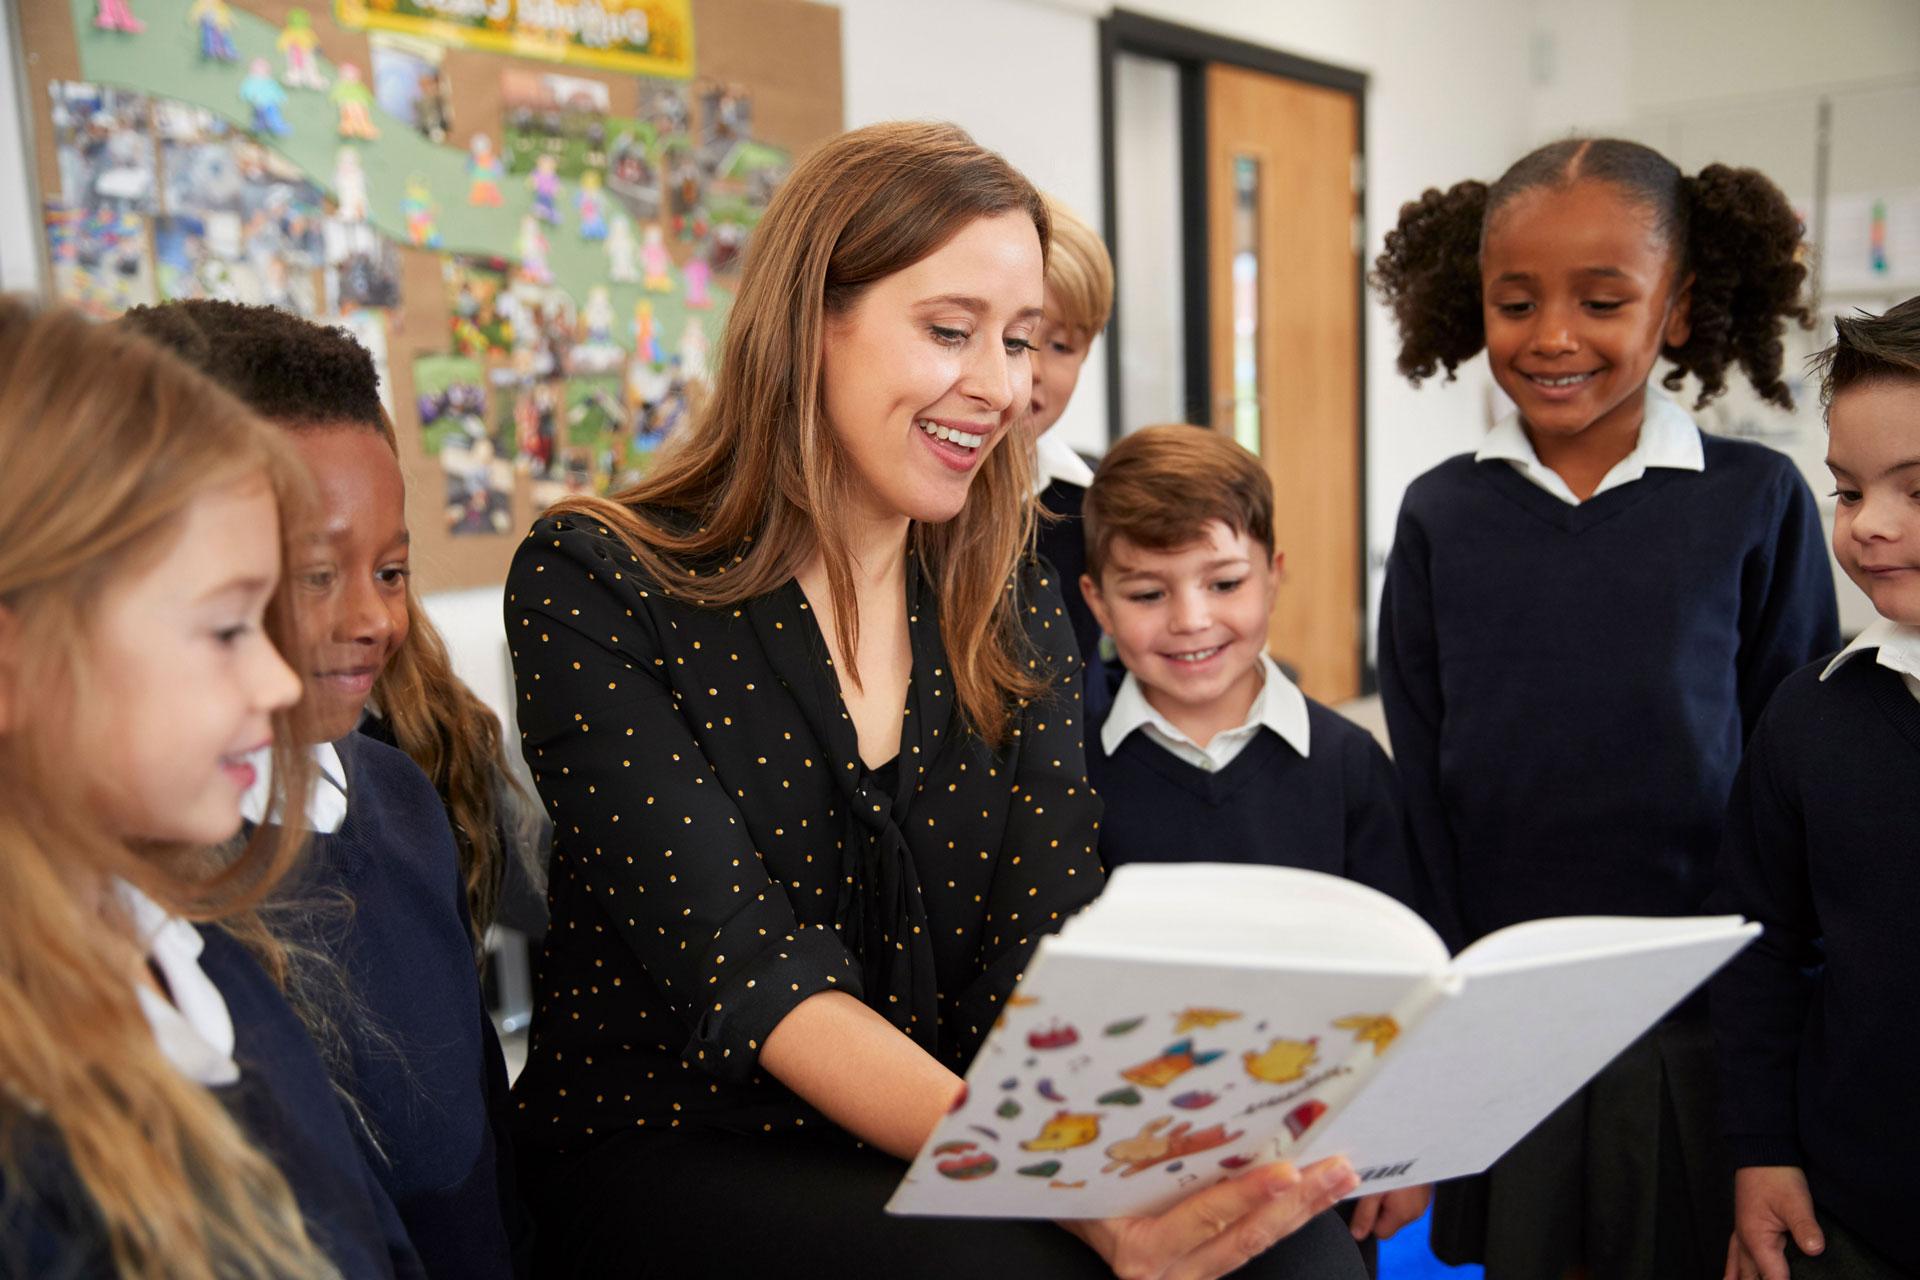 female-primary-school-teacher-reading-to-a-class-C65QJRL-rotate.jpg